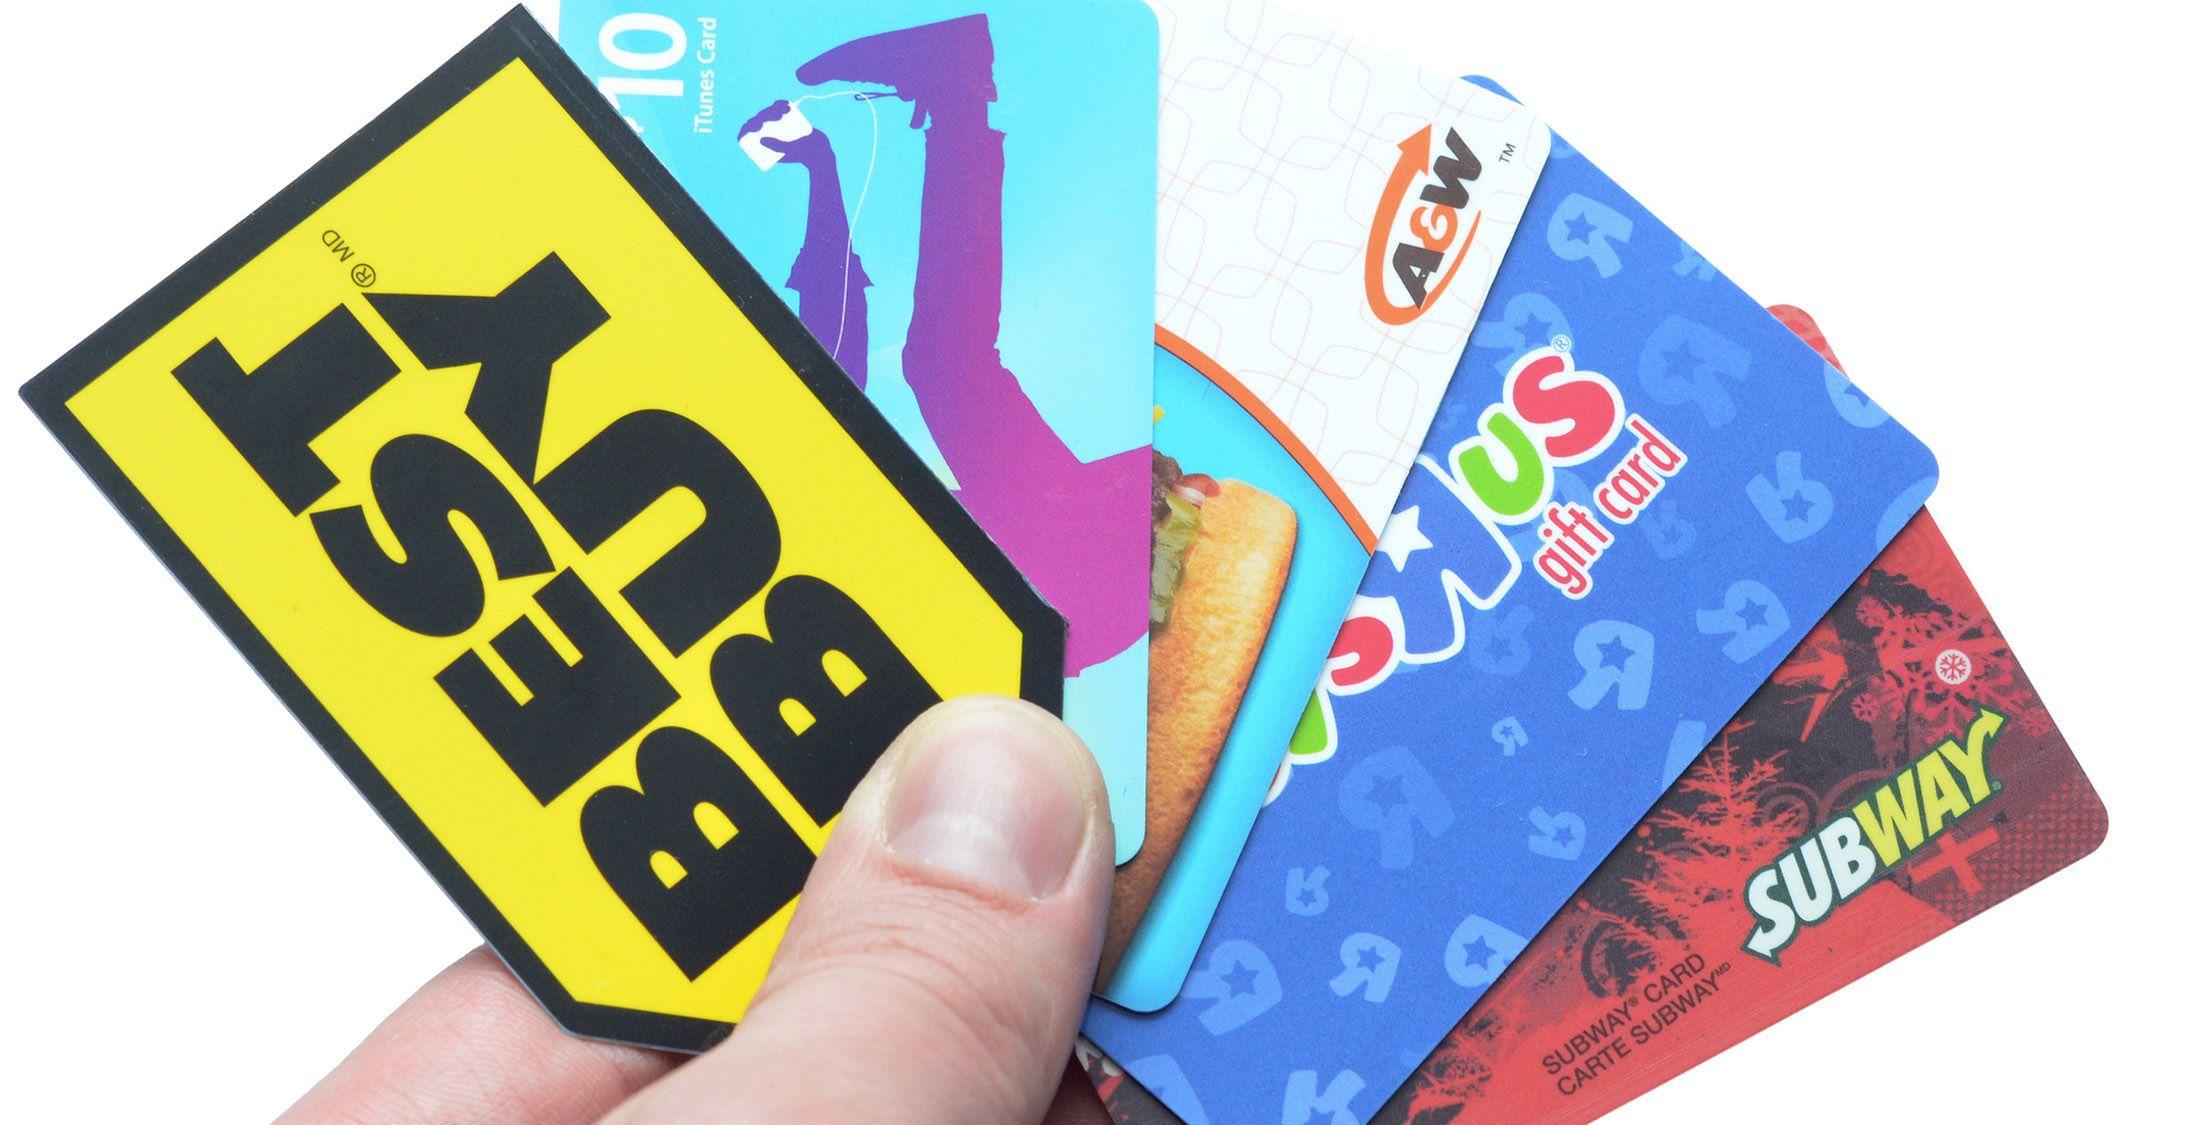 best buy itunes subway gift cards in hand